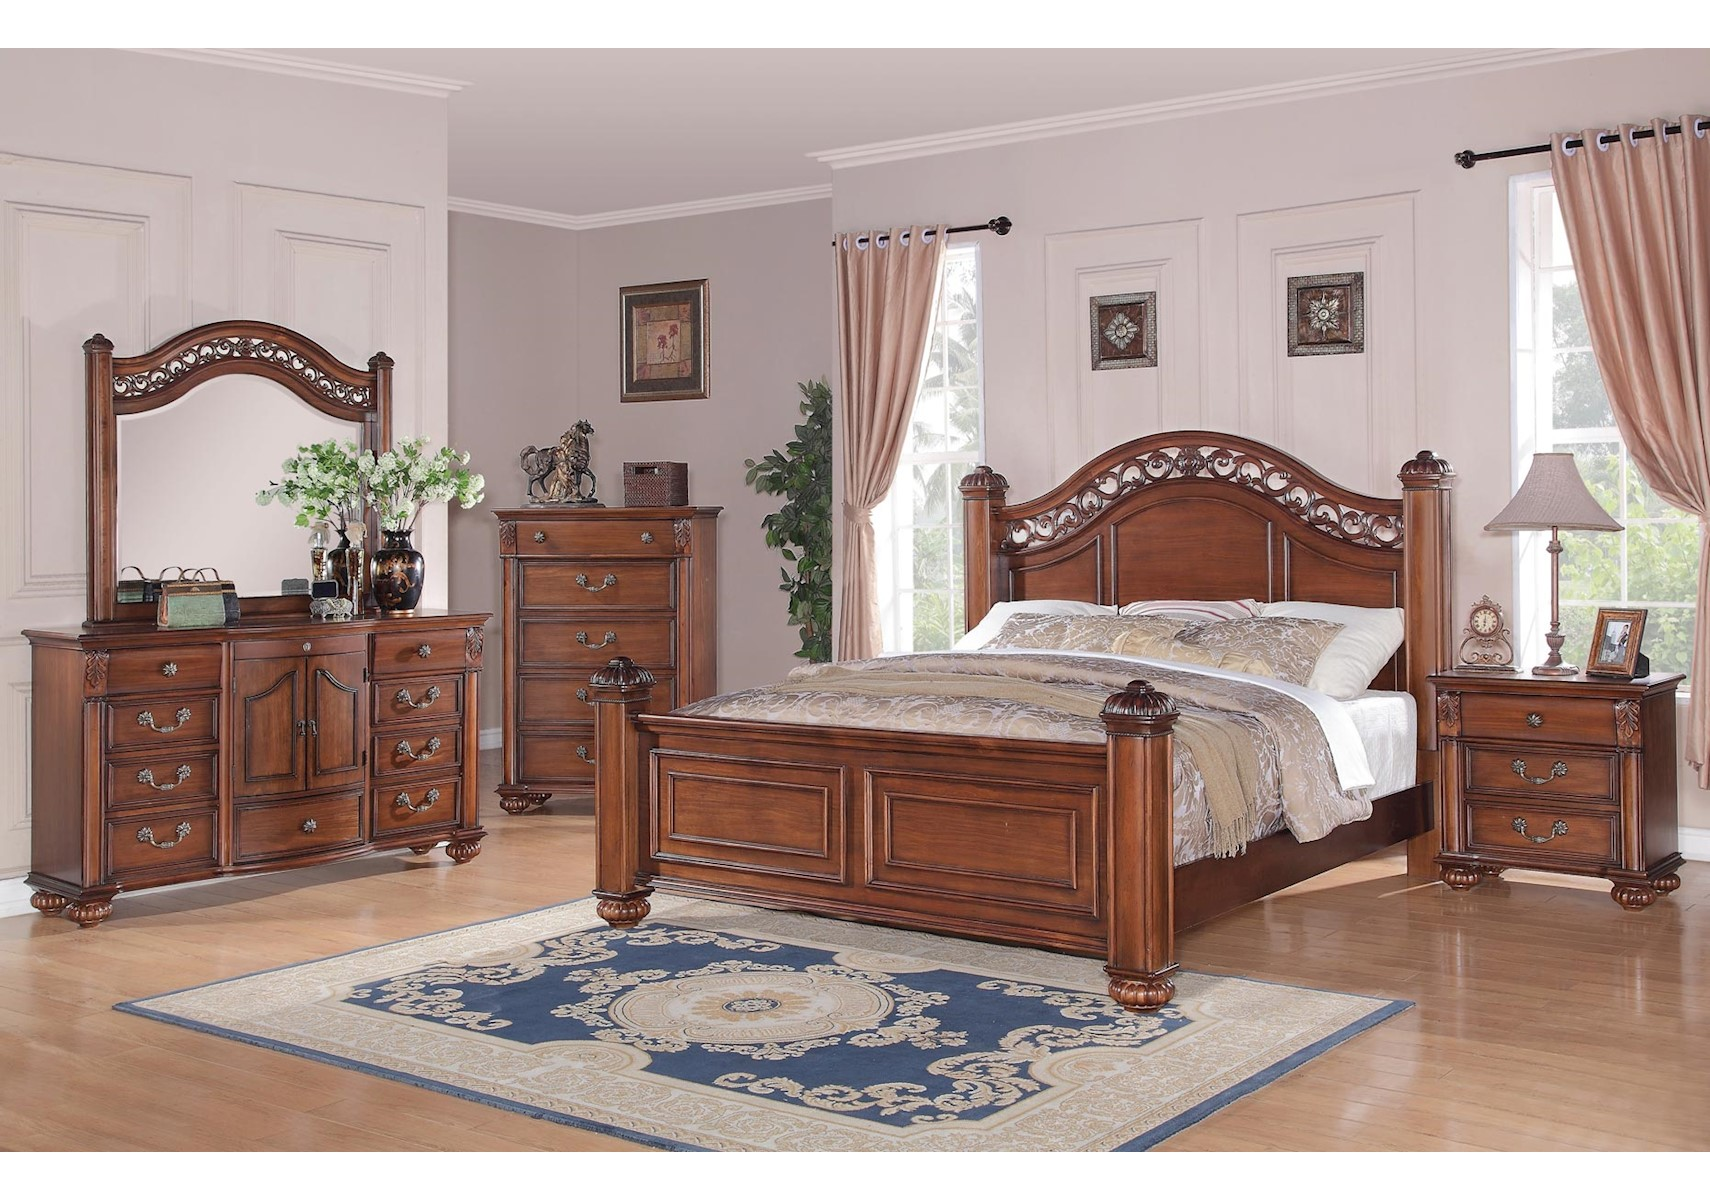 Barkley Square 4 Pc Queen Bedroom Set. Lacks   Barkley Square 4 Pc Queen Bedroom Set